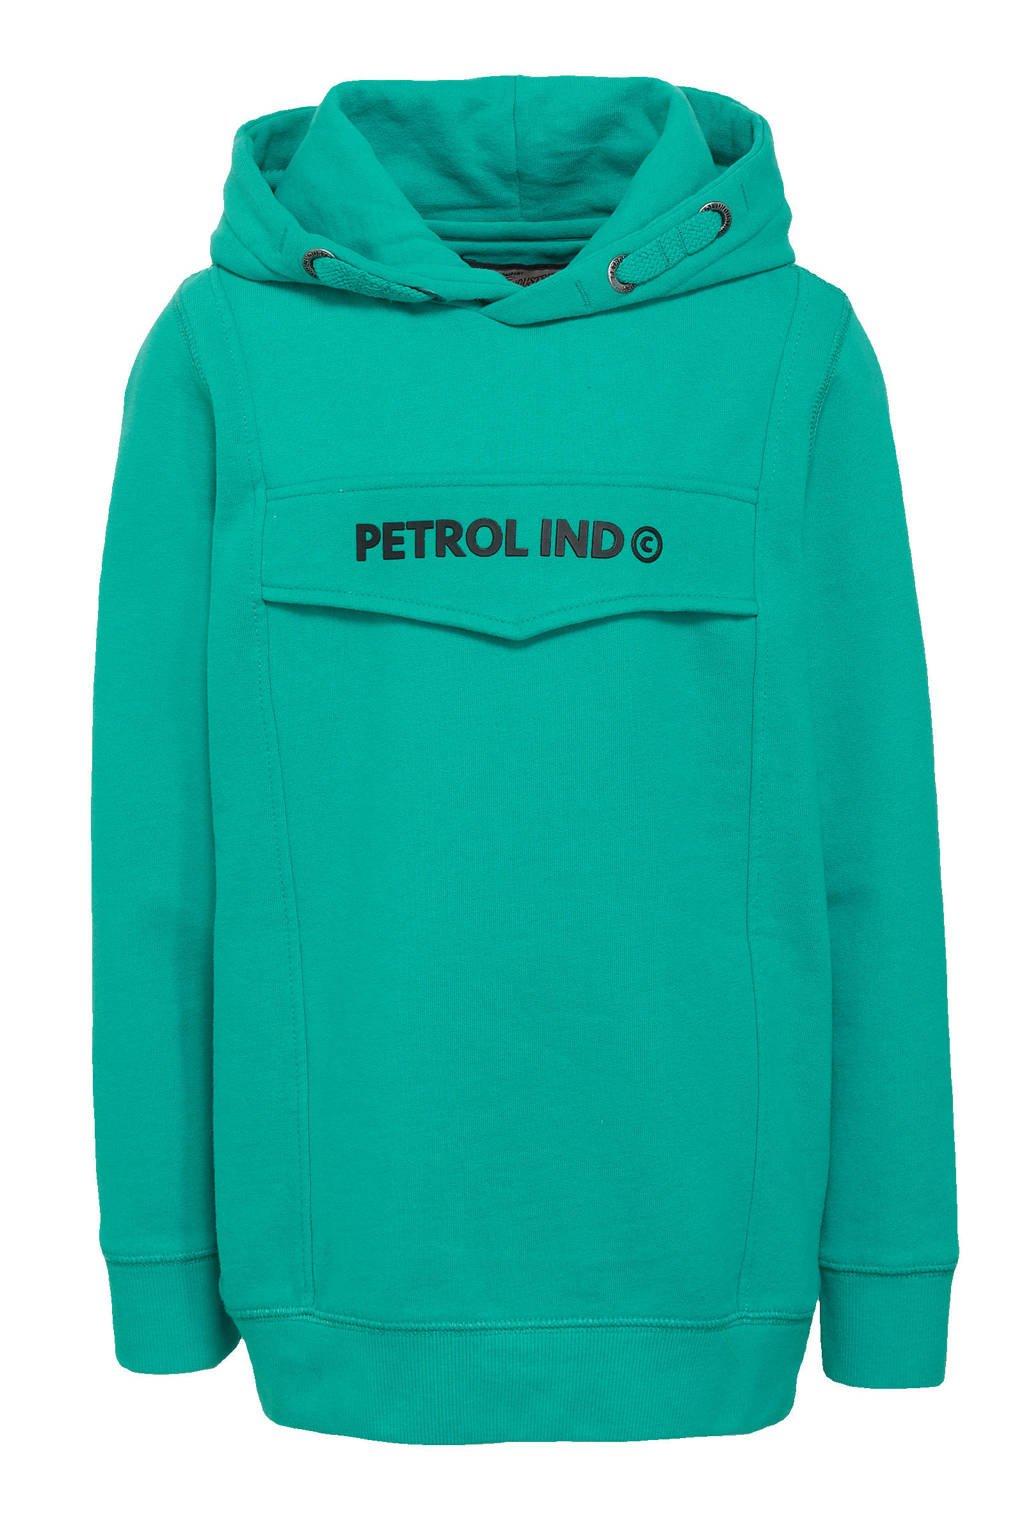 Petrol Industries hoodie met logo zeegroen, Zeegroen